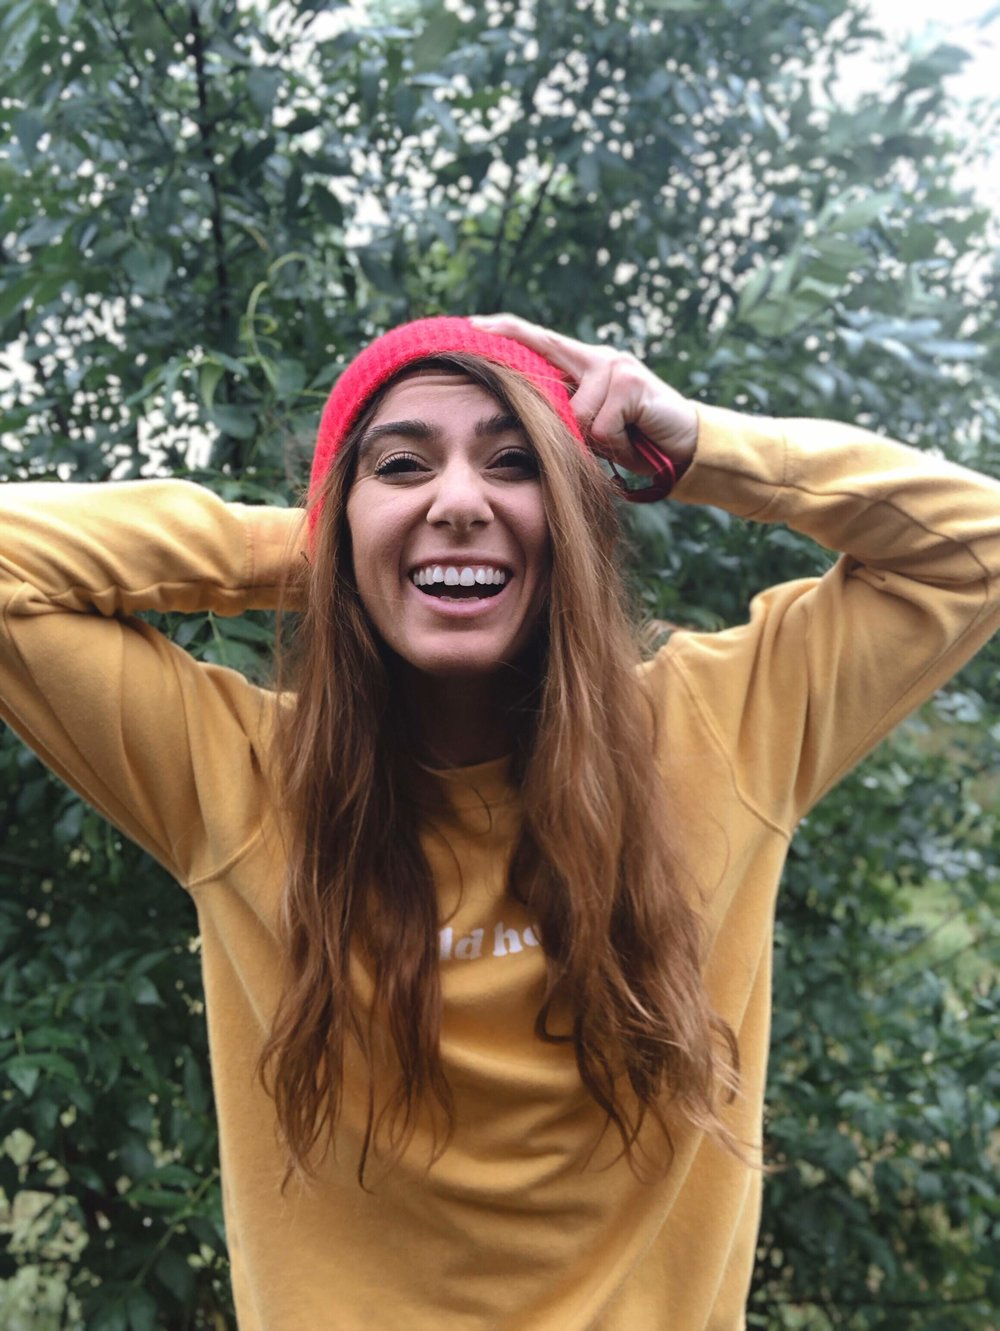 Wild Honey sweatshirt by IndyBrand Clothing